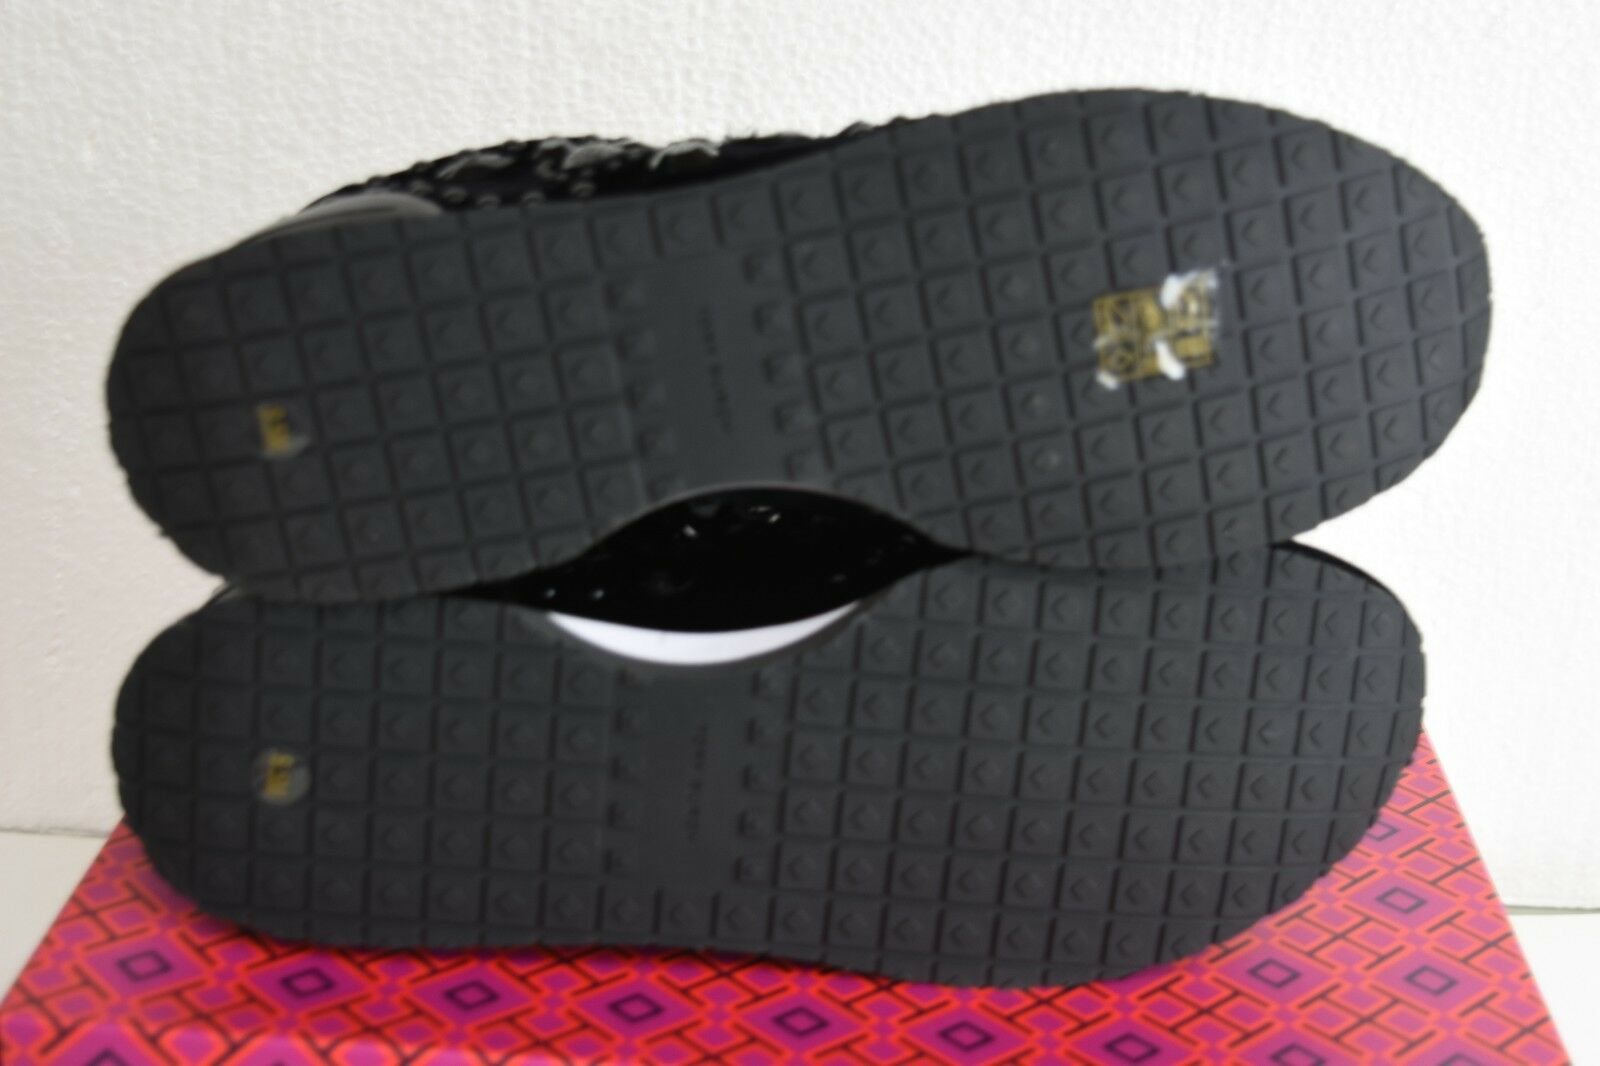 Neuf Tory Burch Scarlett Runner Velours Velours Velours Décoré Baskets Chaussures Noires 9.5 8 0f760a